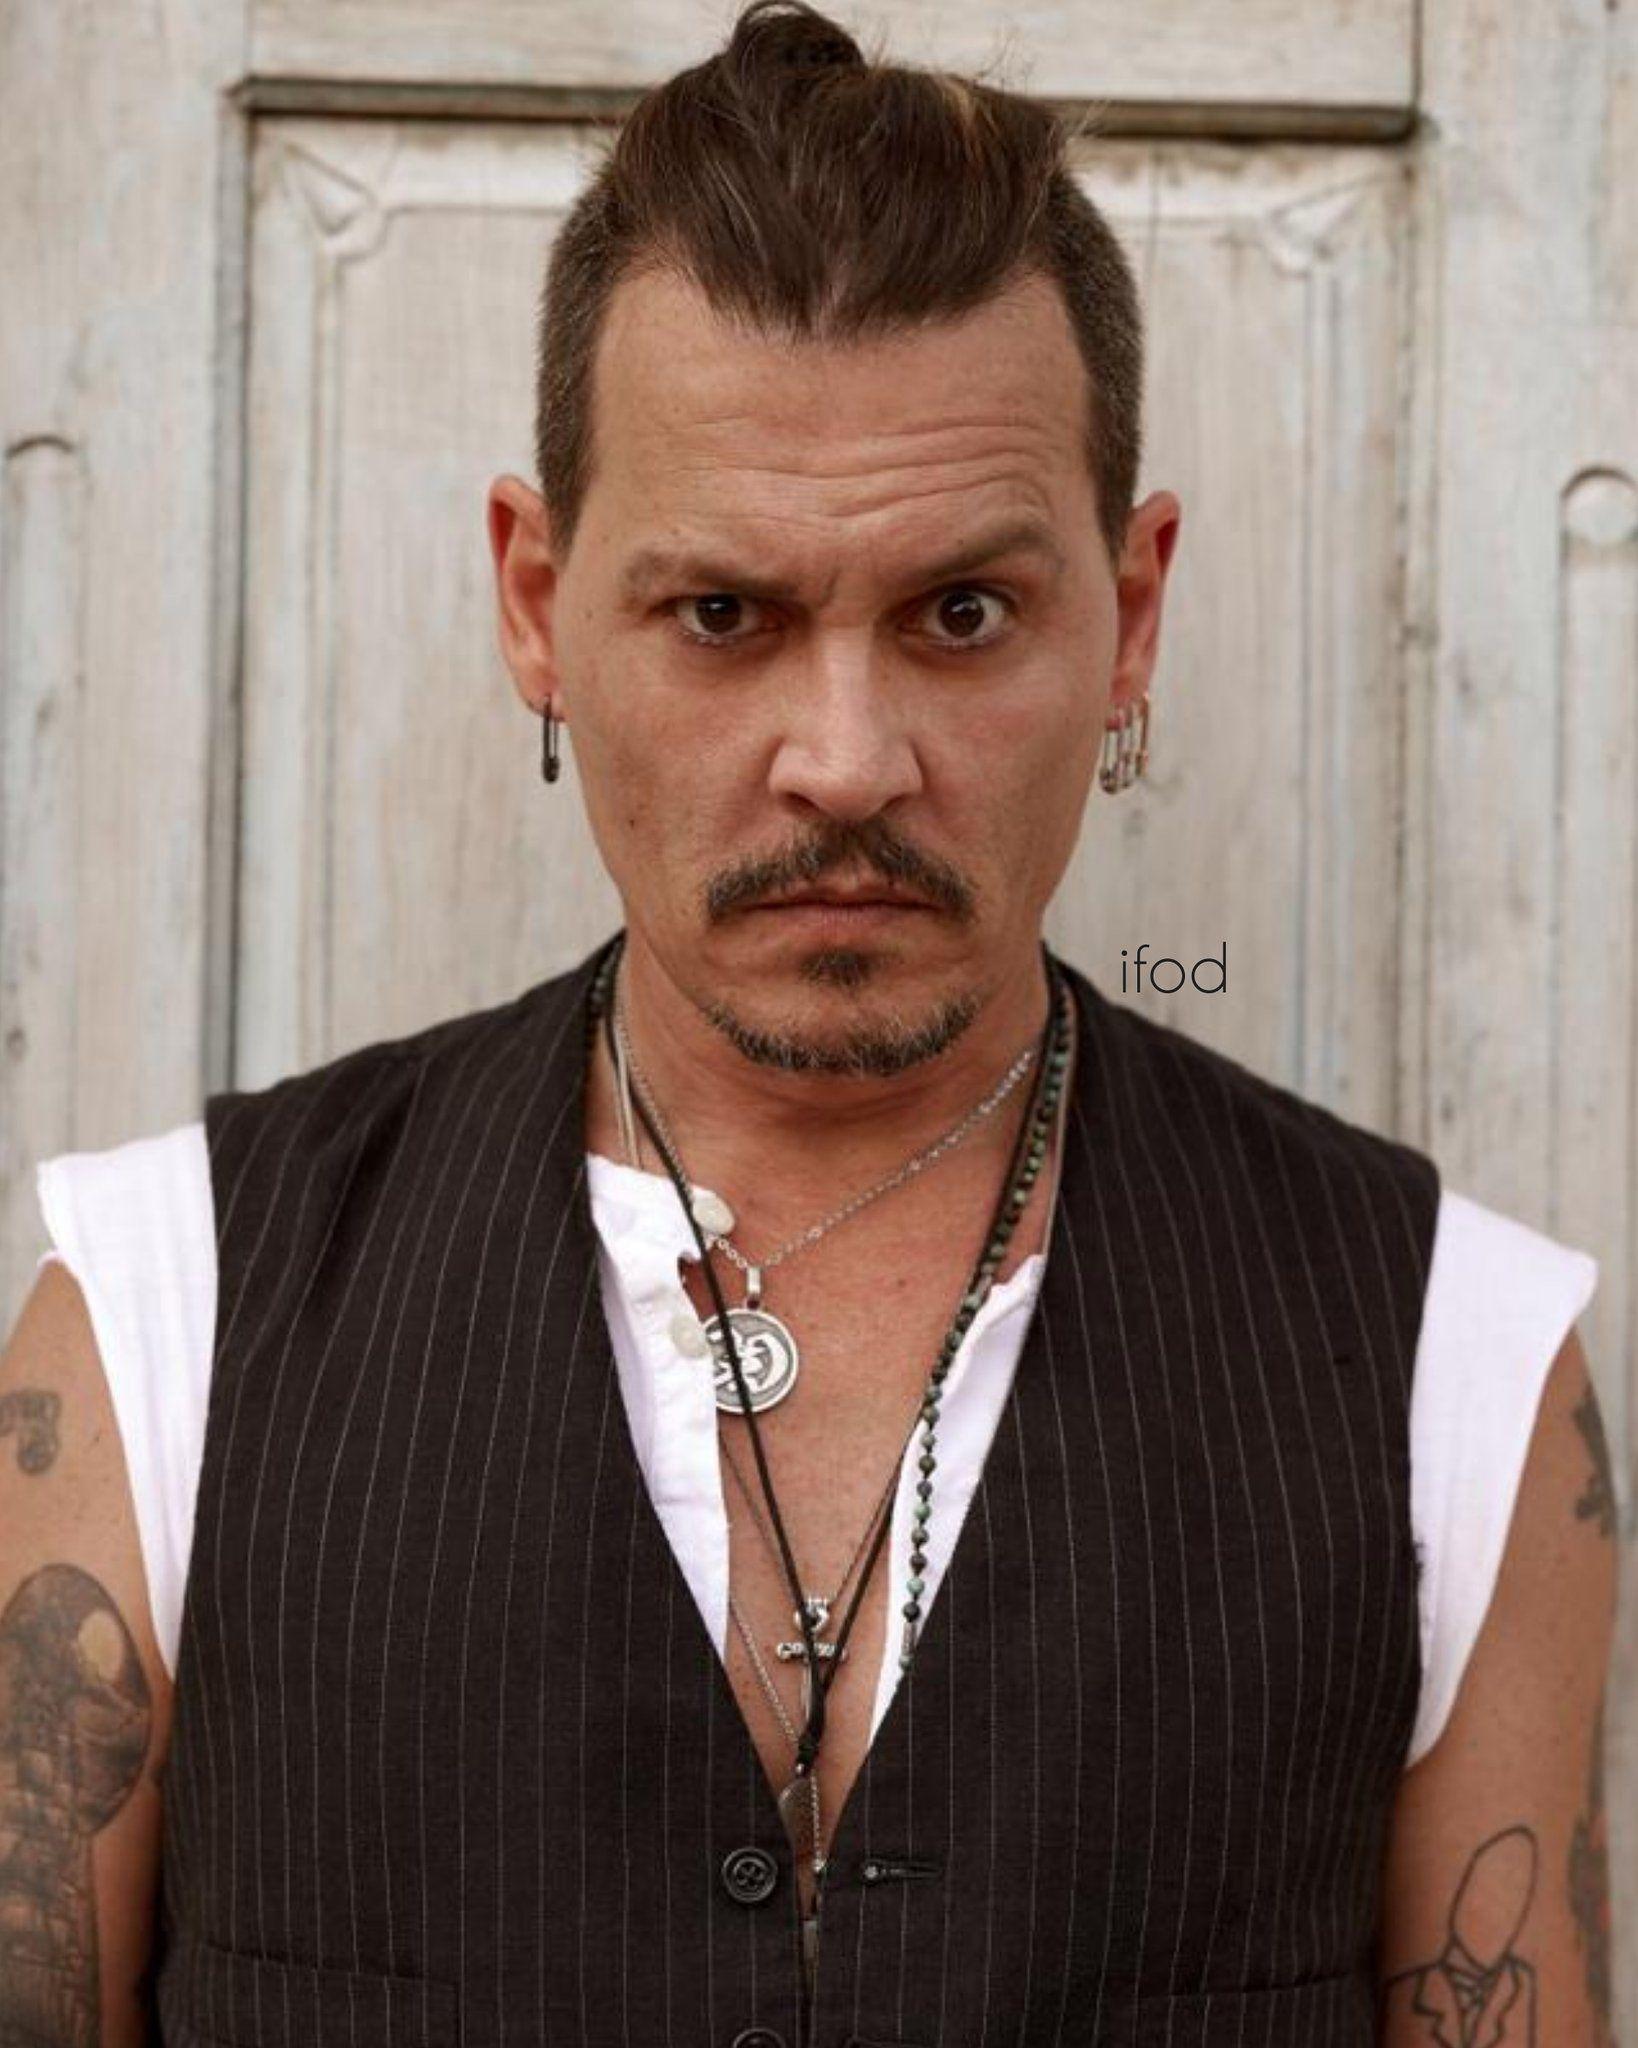 Johnny Depp GQ British Magazine 😍😍 Photo made by Greg